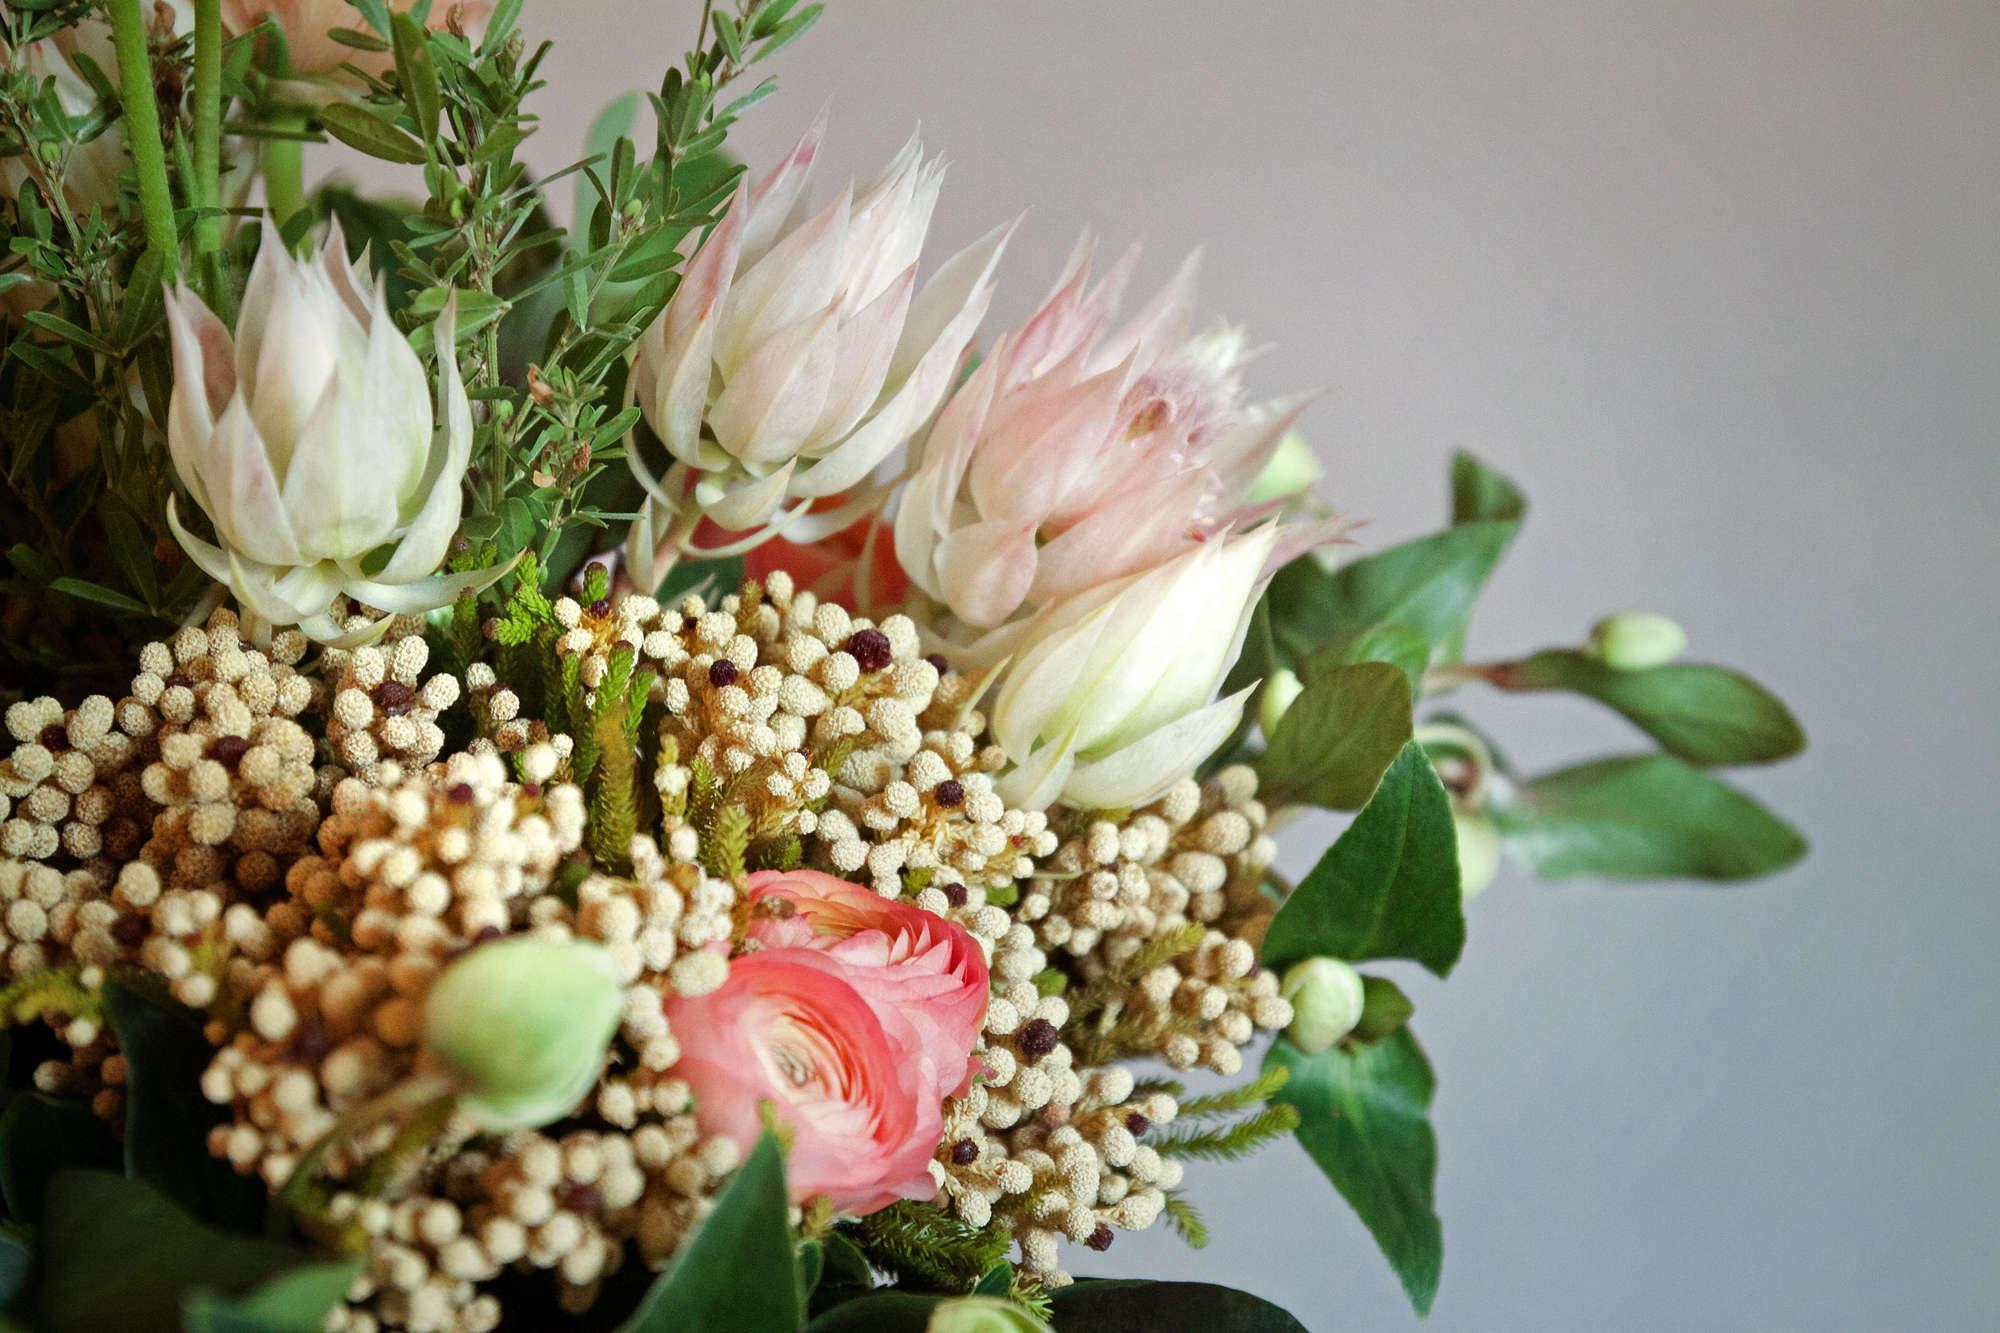 Nyc Flower Market 5 Floral Arrangements For 200 Gardenista